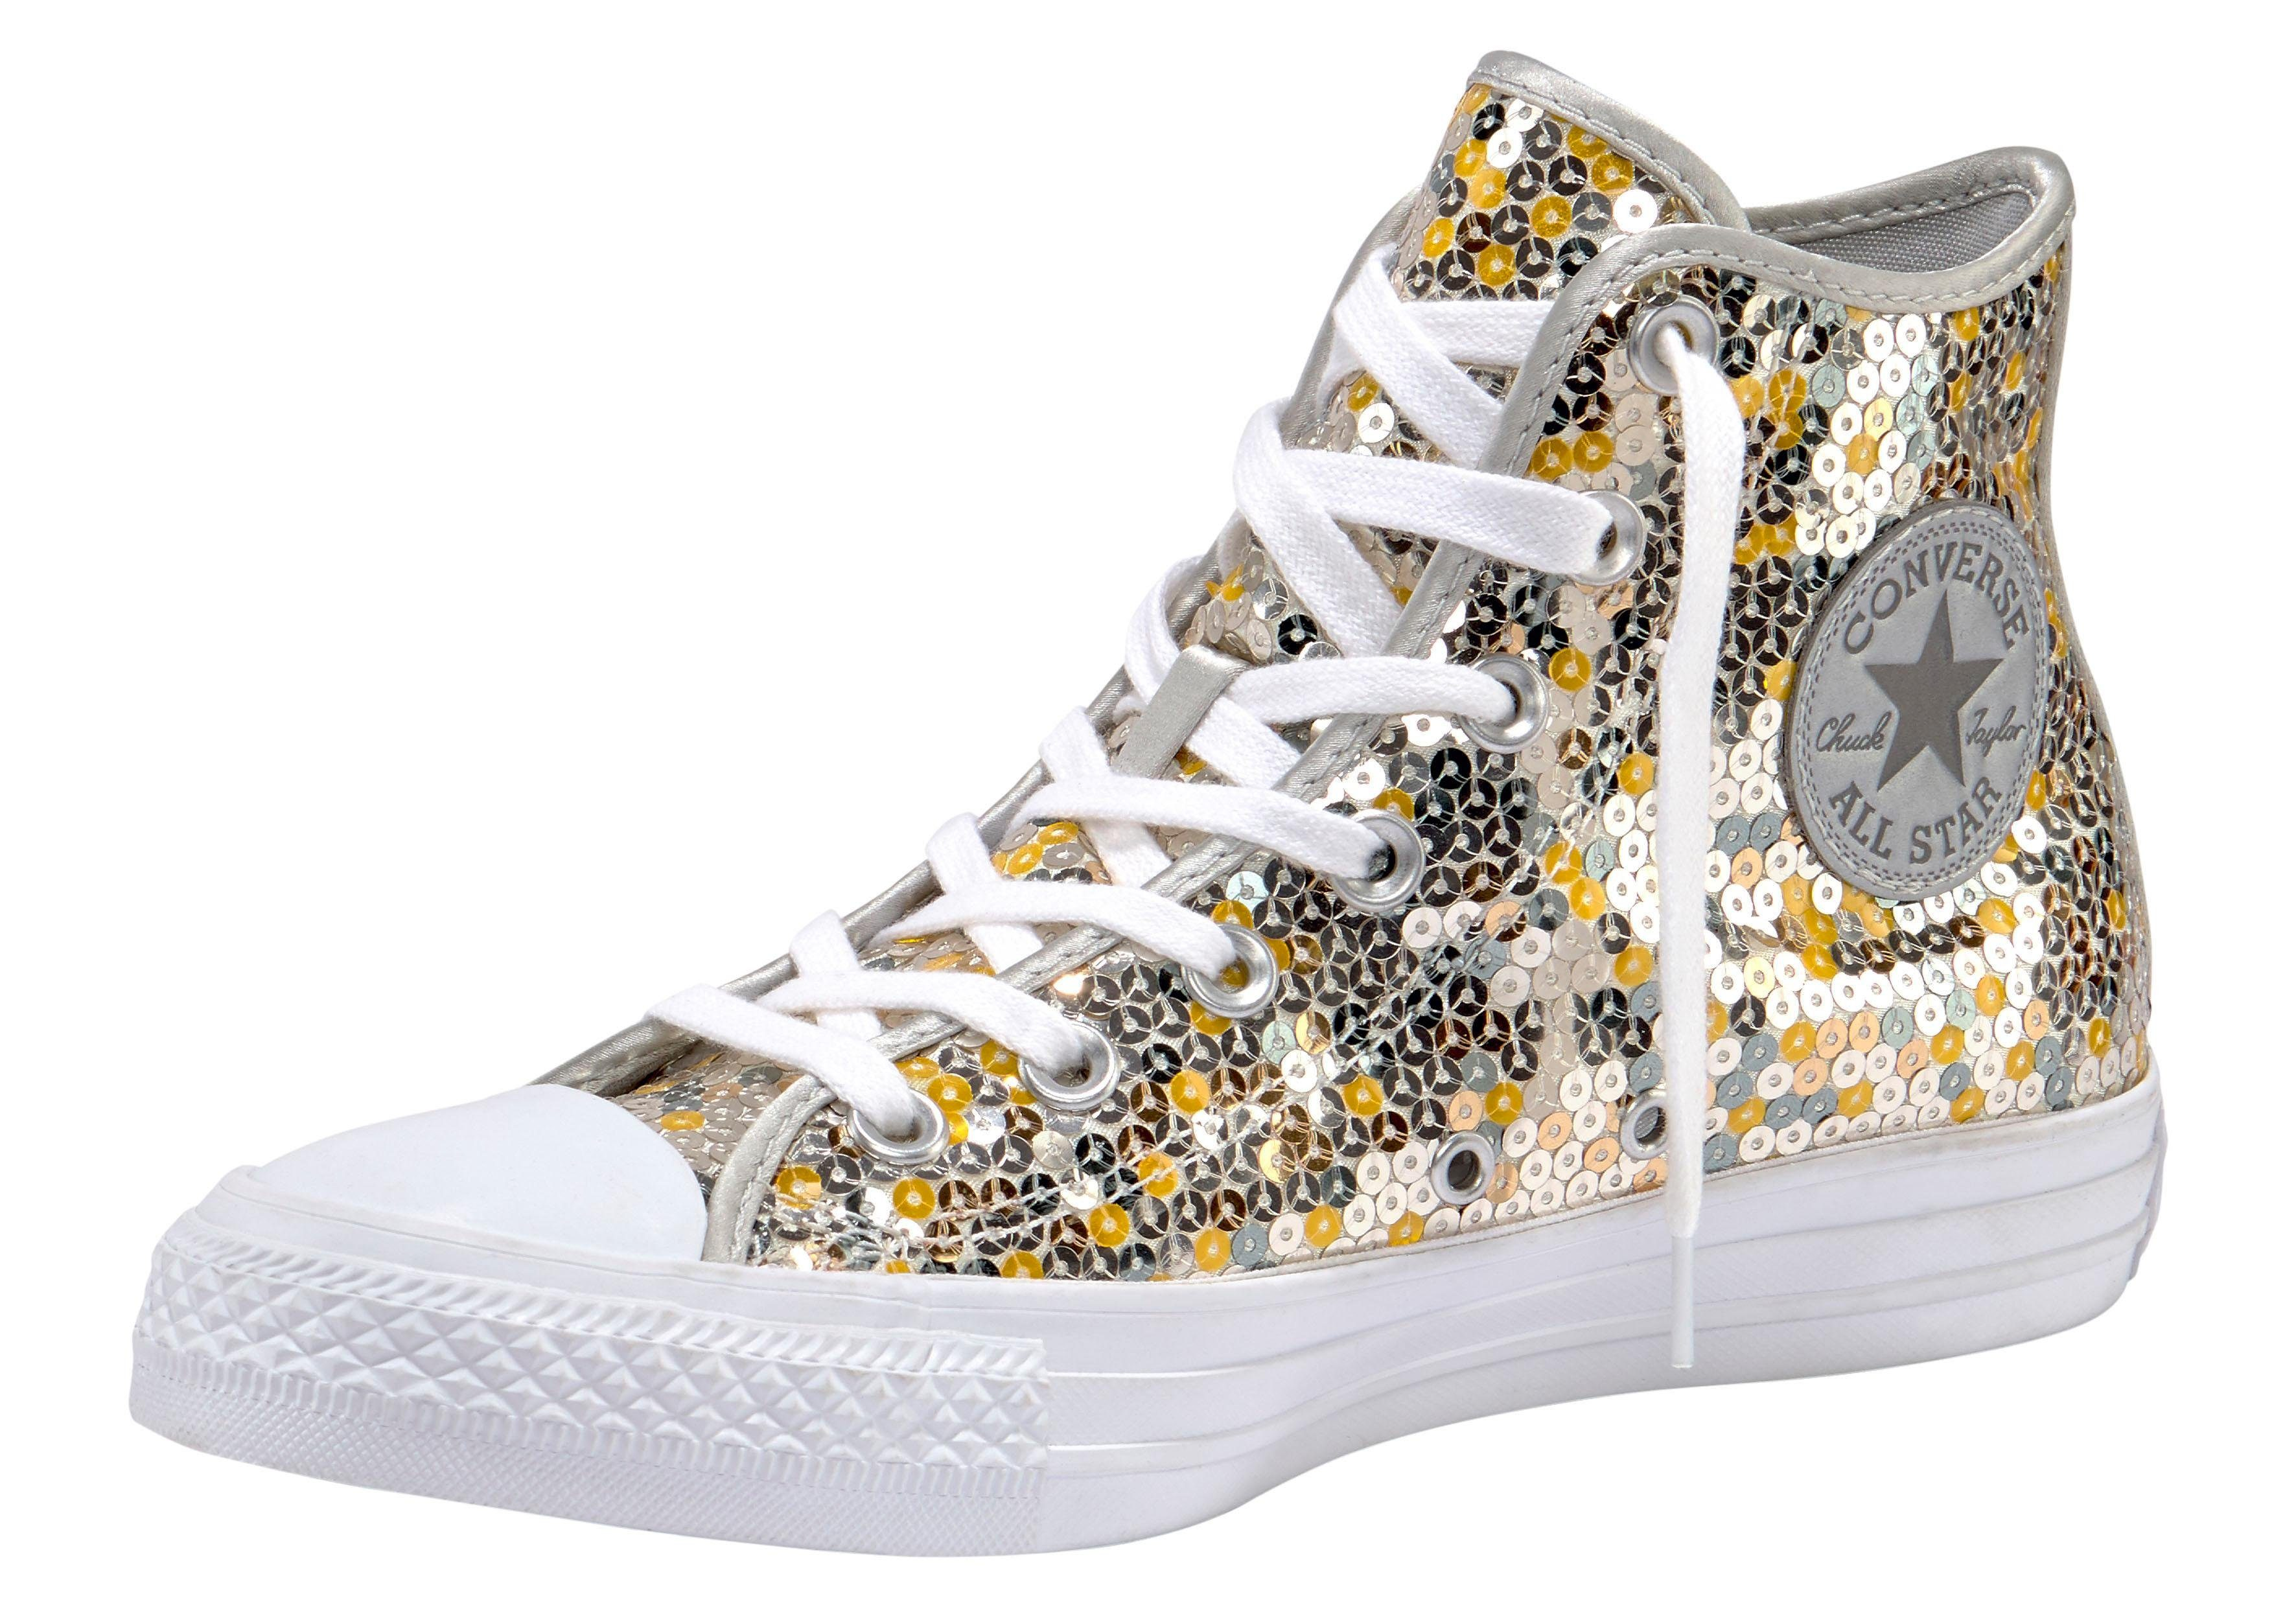 Converse »Chuck Taylor All Star Pailetten Hi« Sneaker online kaufen | OTTO